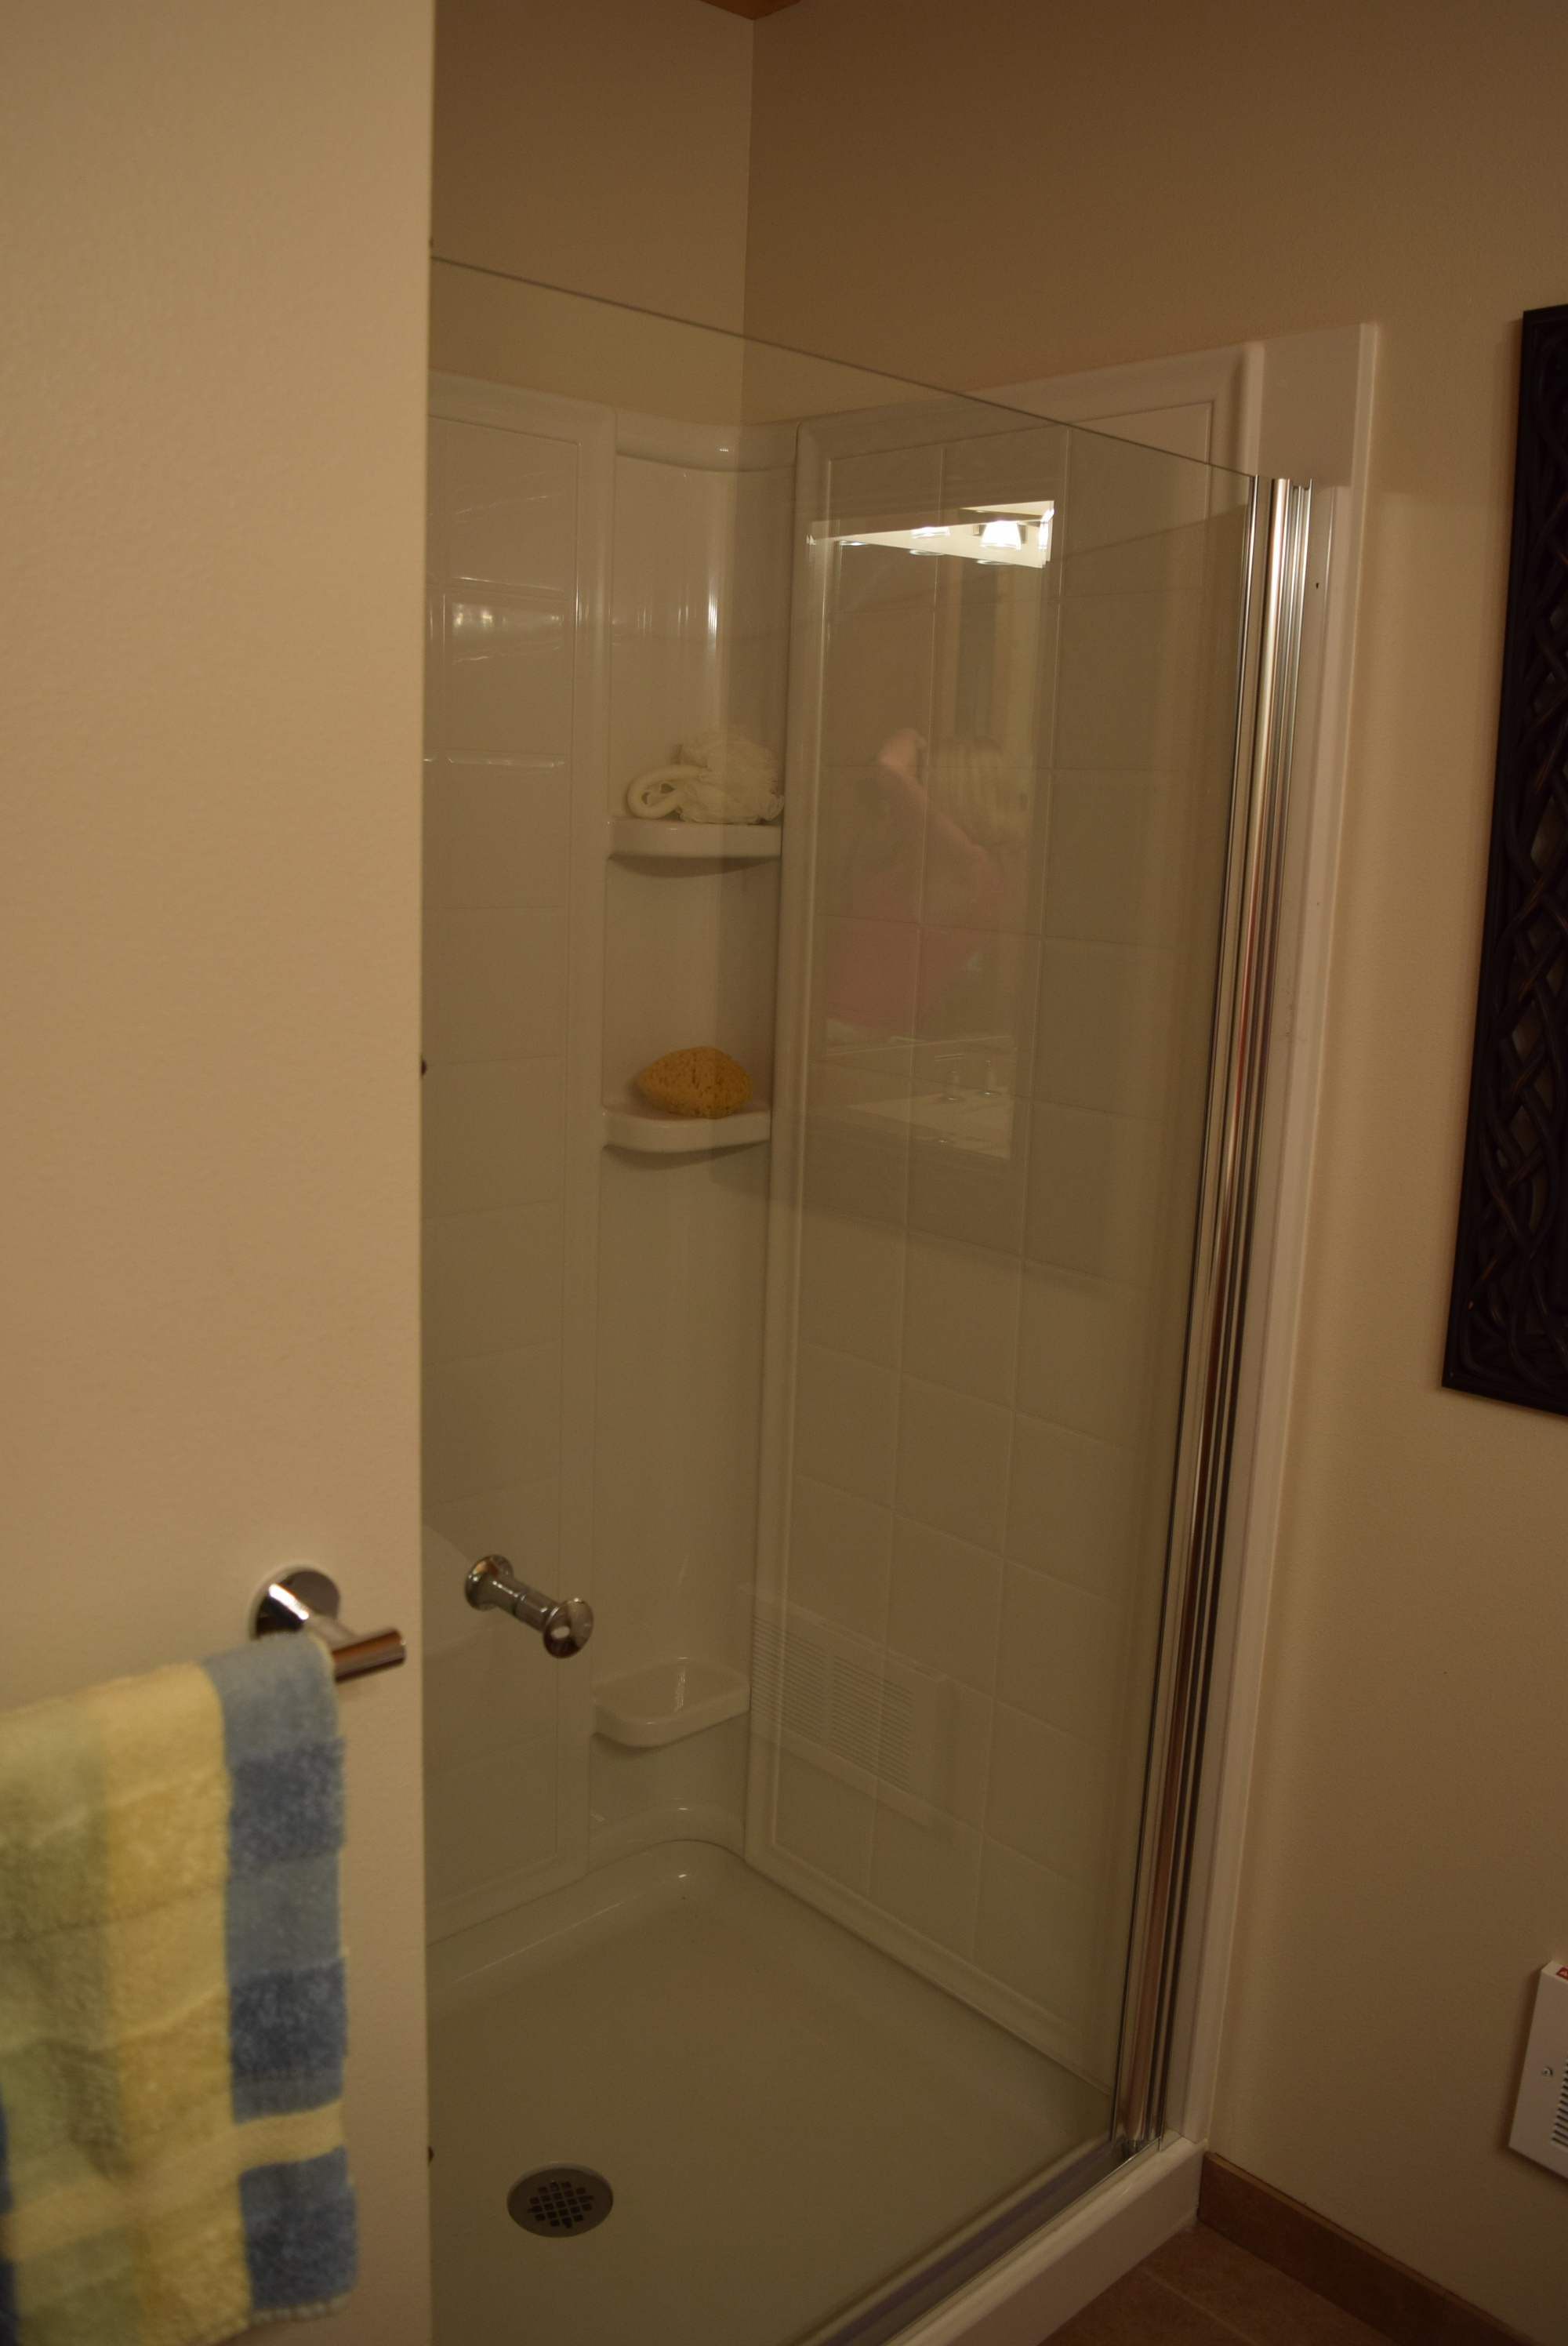 Downstairs shower.